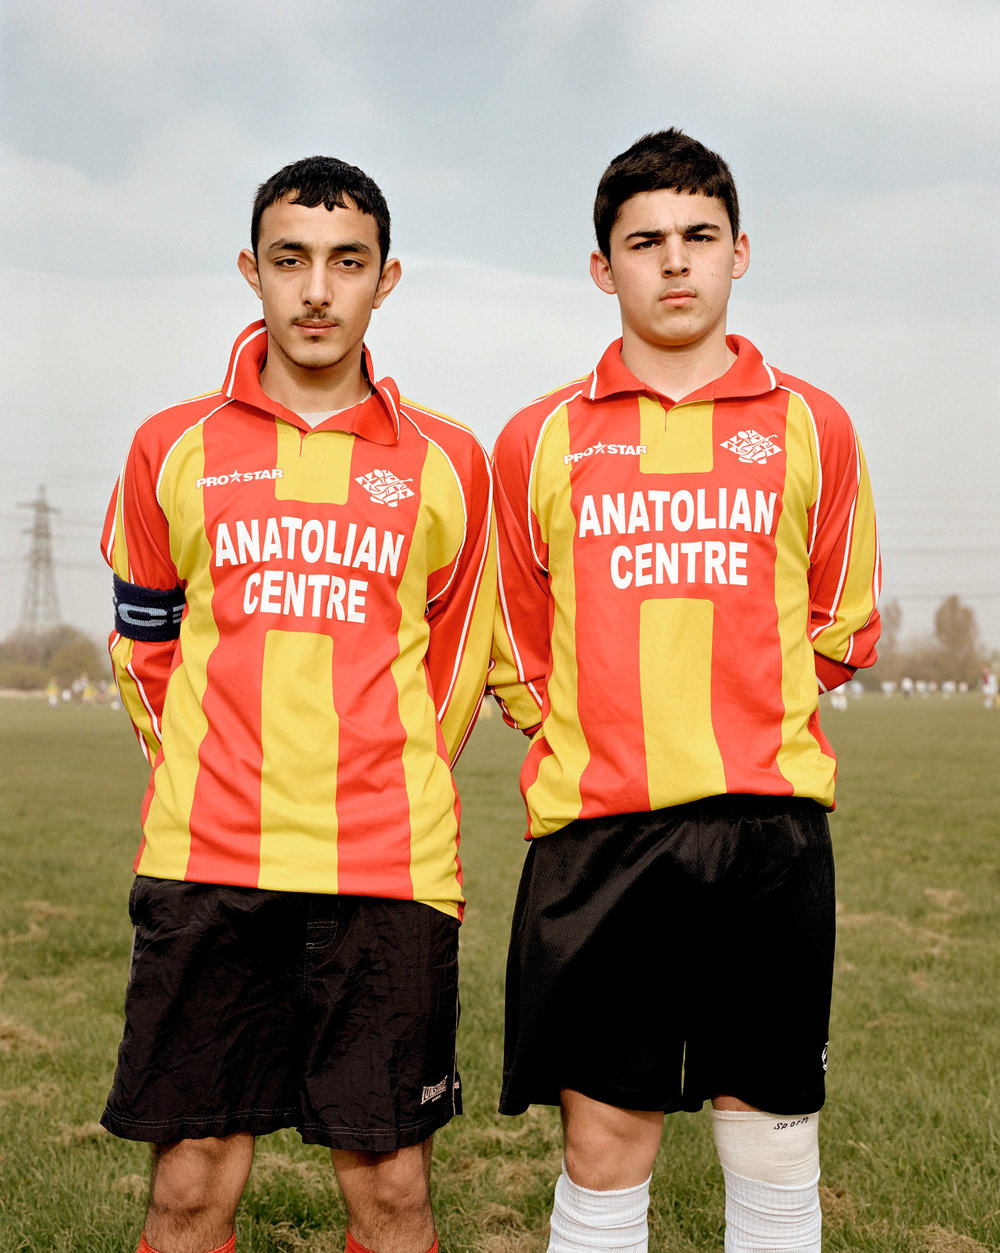 Reality Football / Andolu FC / London